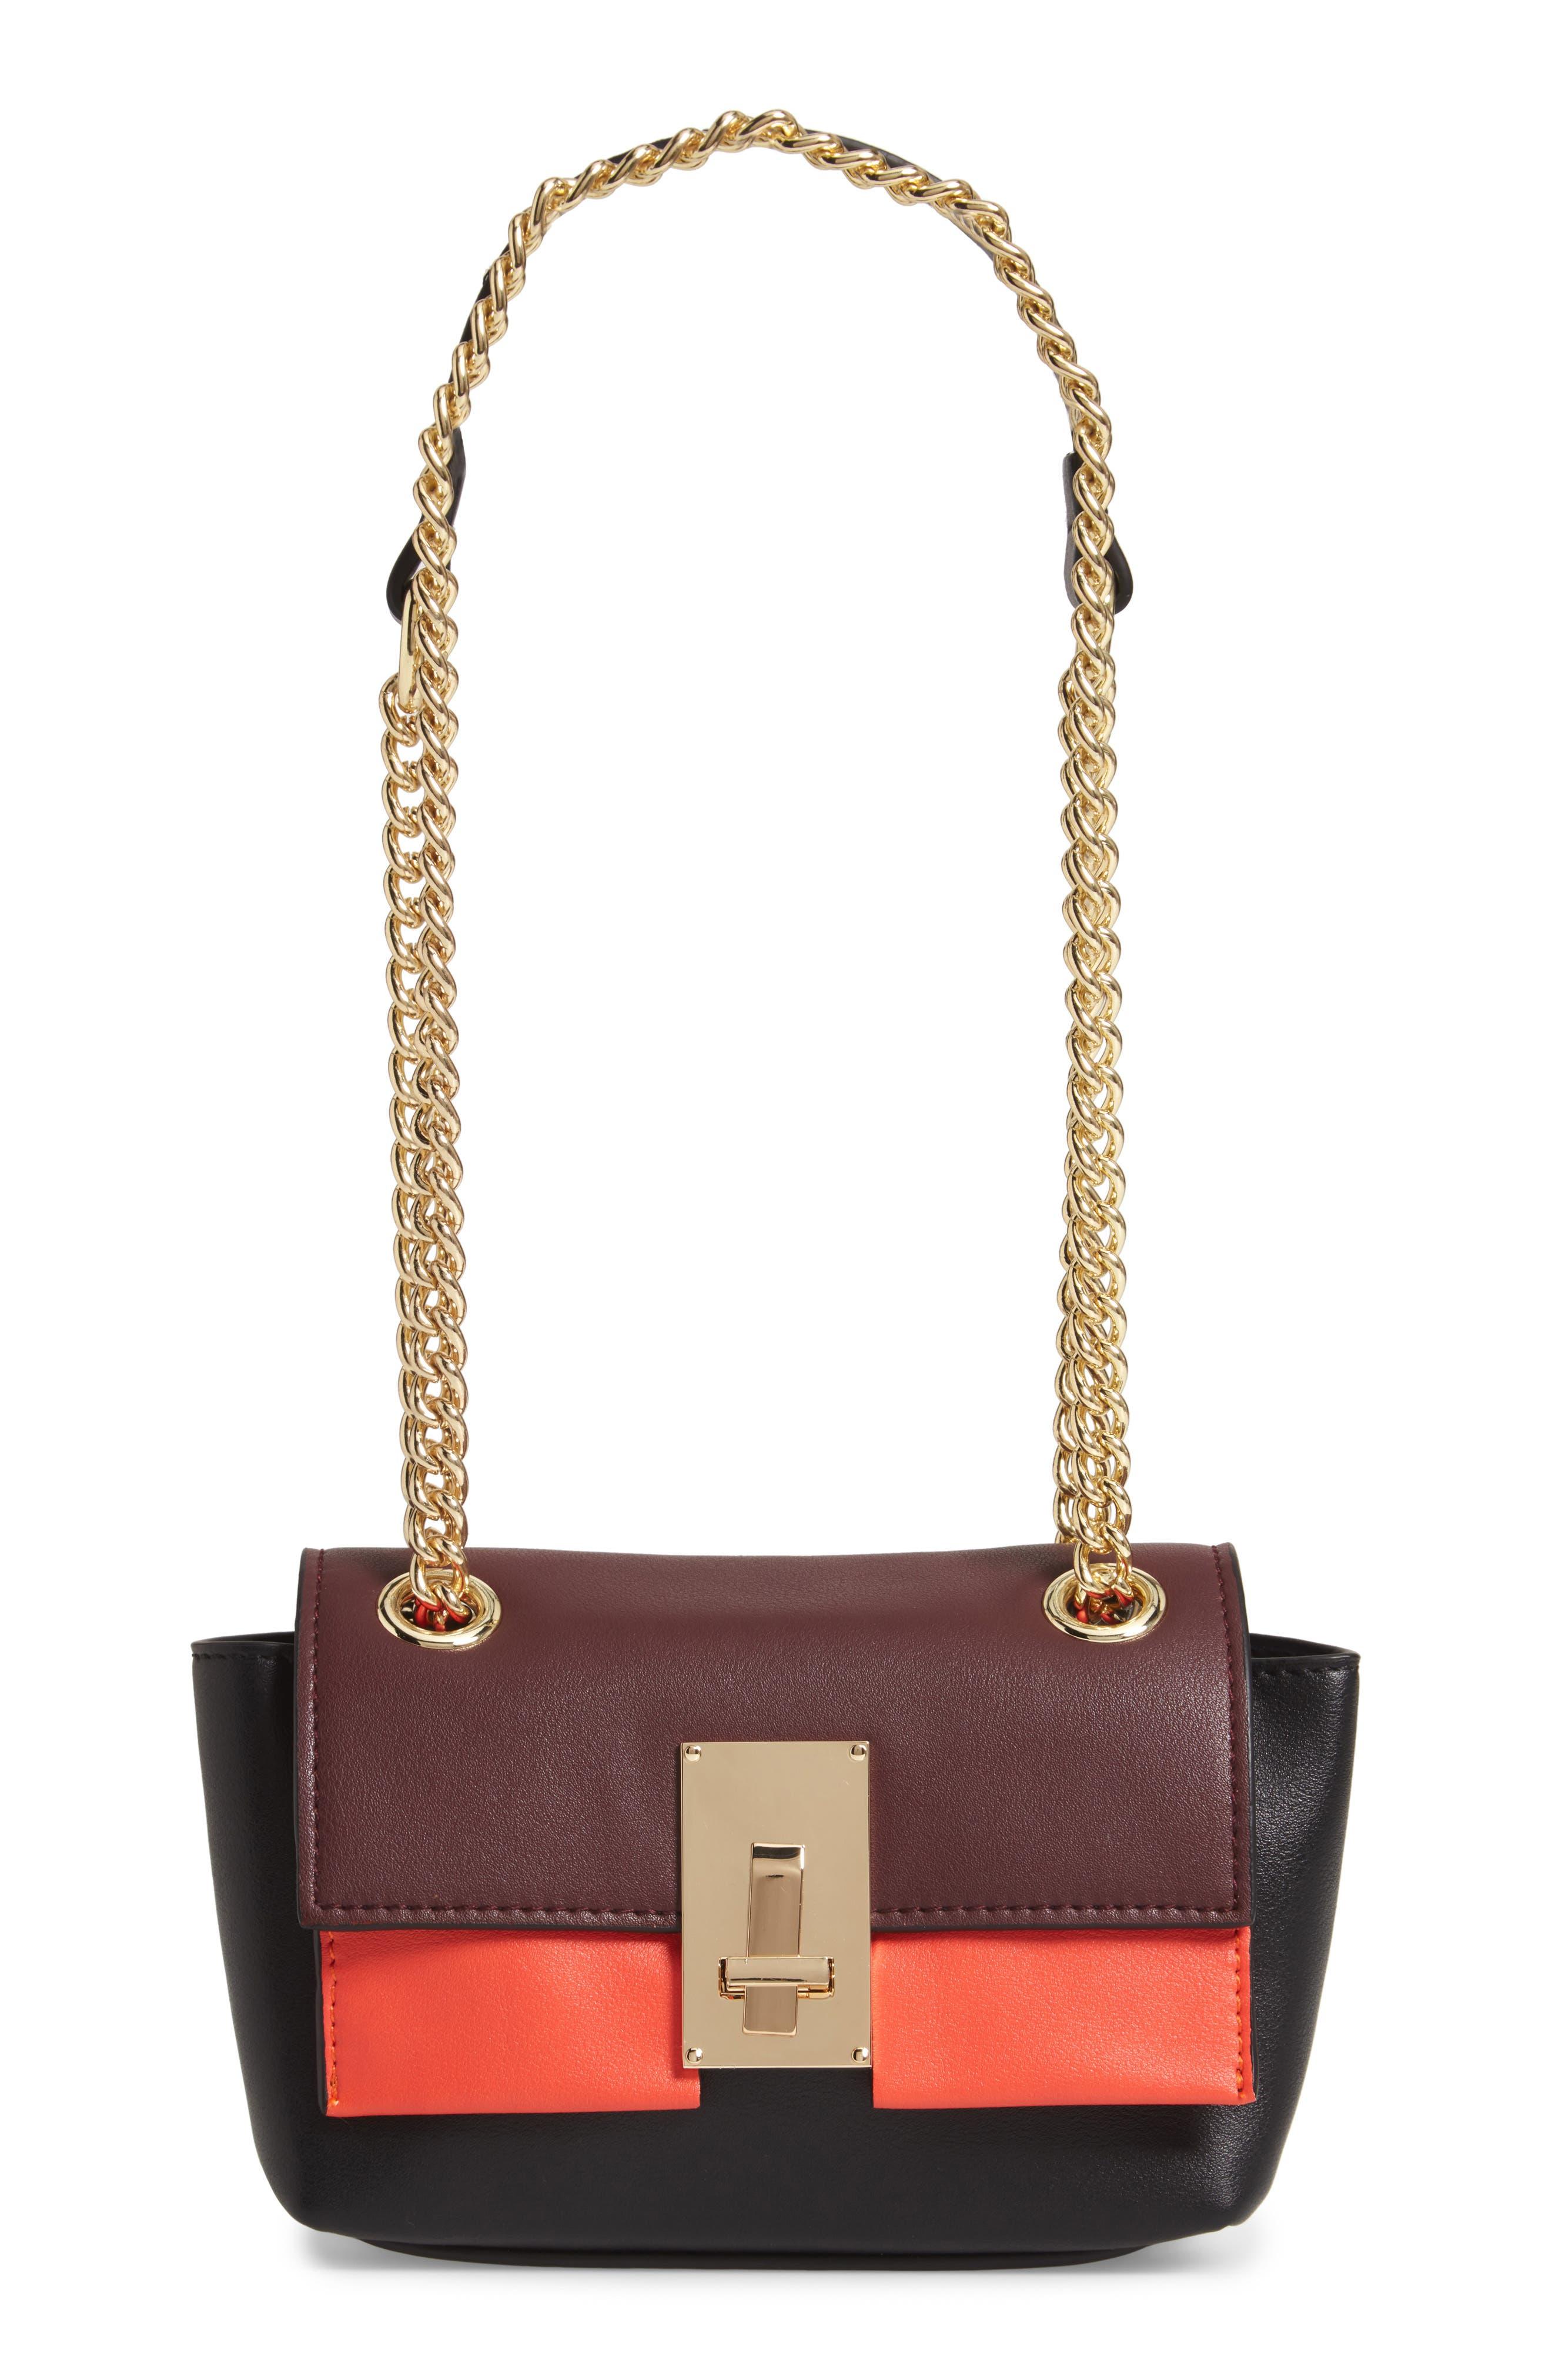 SONDRA ROBERTS Colorblock Handbag - None in Multi Combo